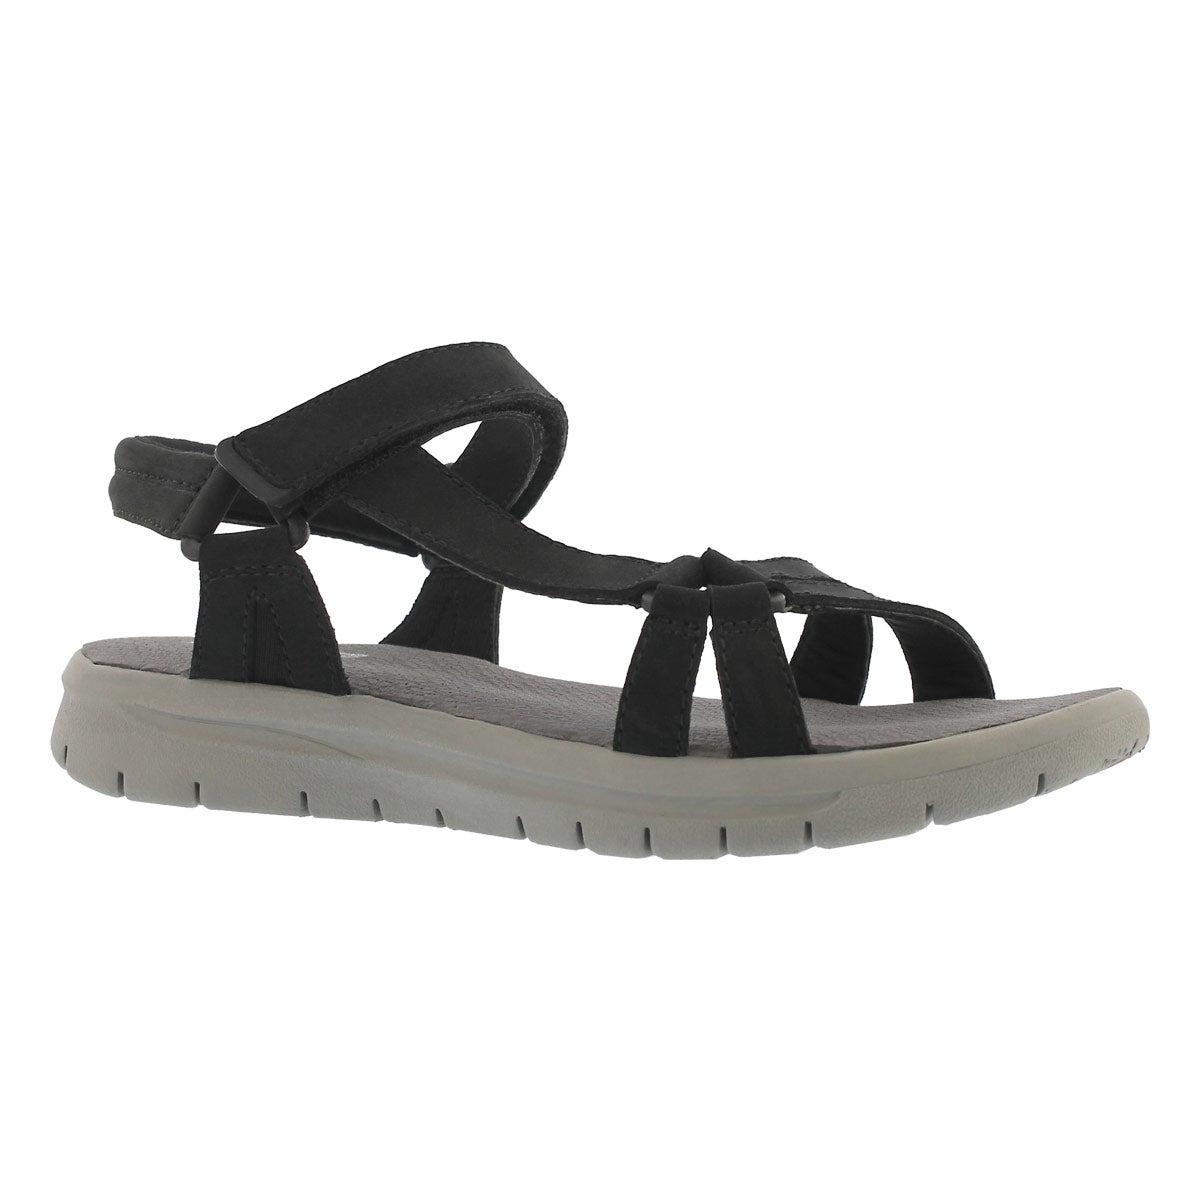 Women's CHRISSY black sport sandals